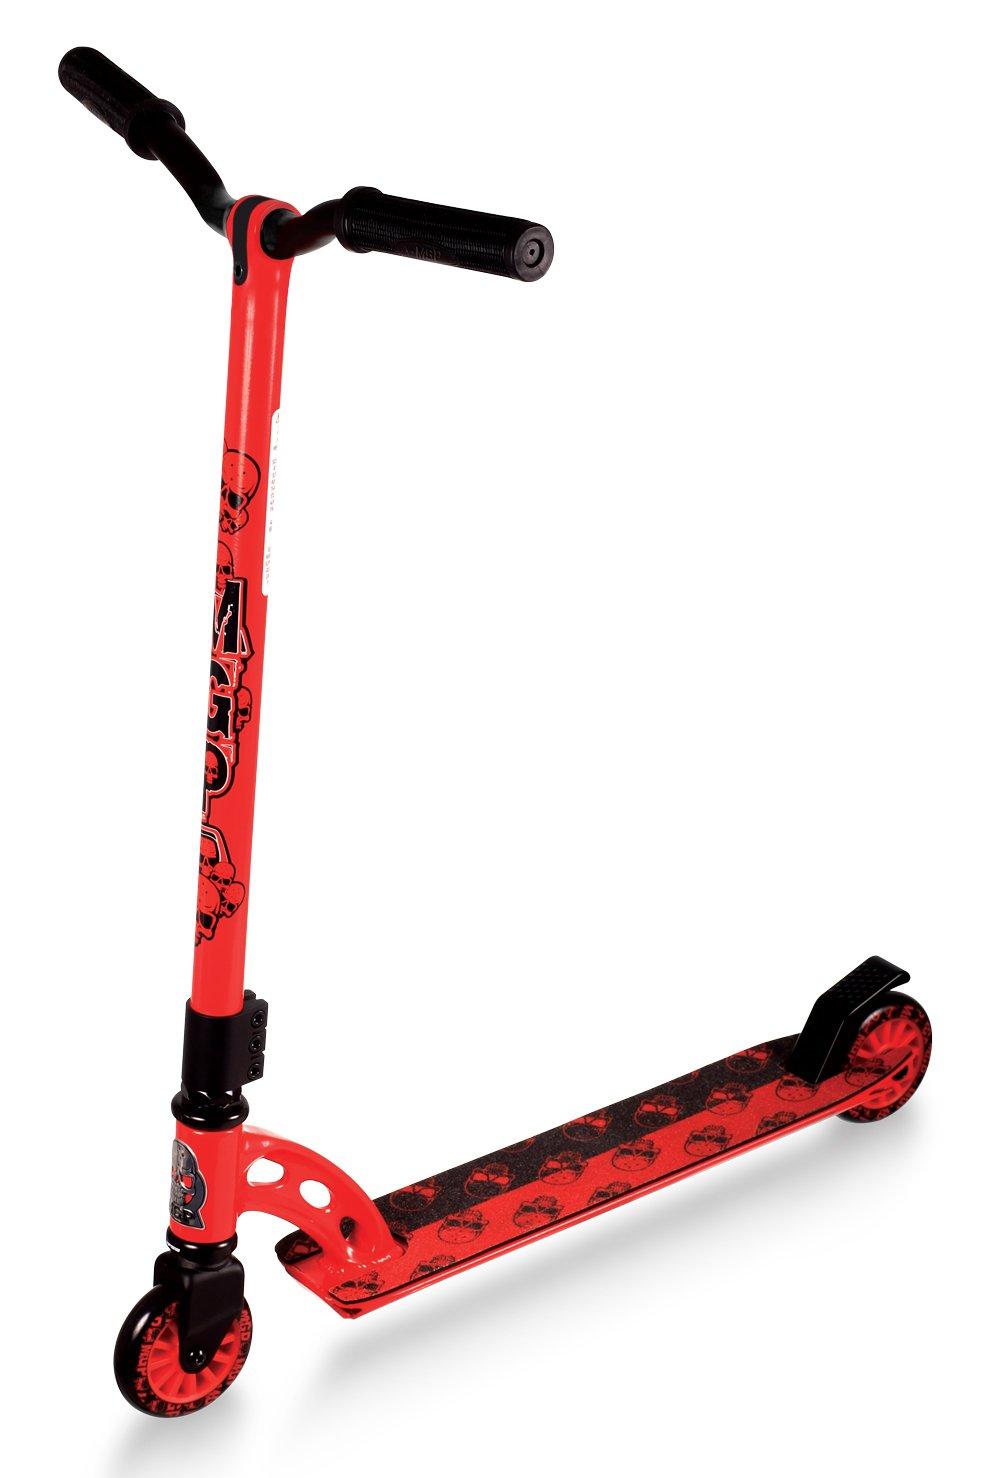 Amazon.com: MADD Gear VX2 Pro Scooter, Rojo: Sports & Outdoors